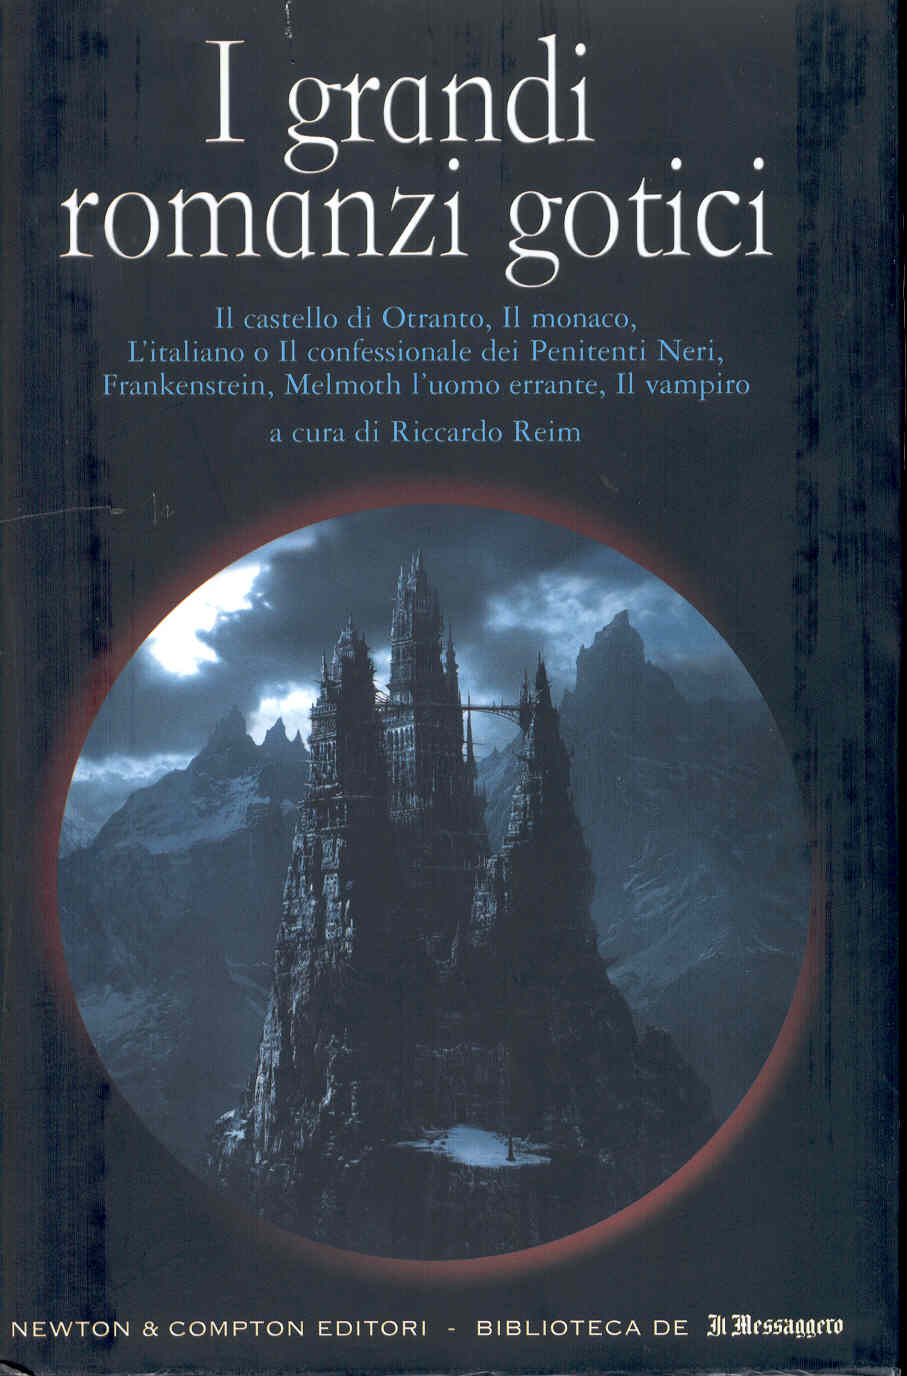 I grandi romanzi gotici